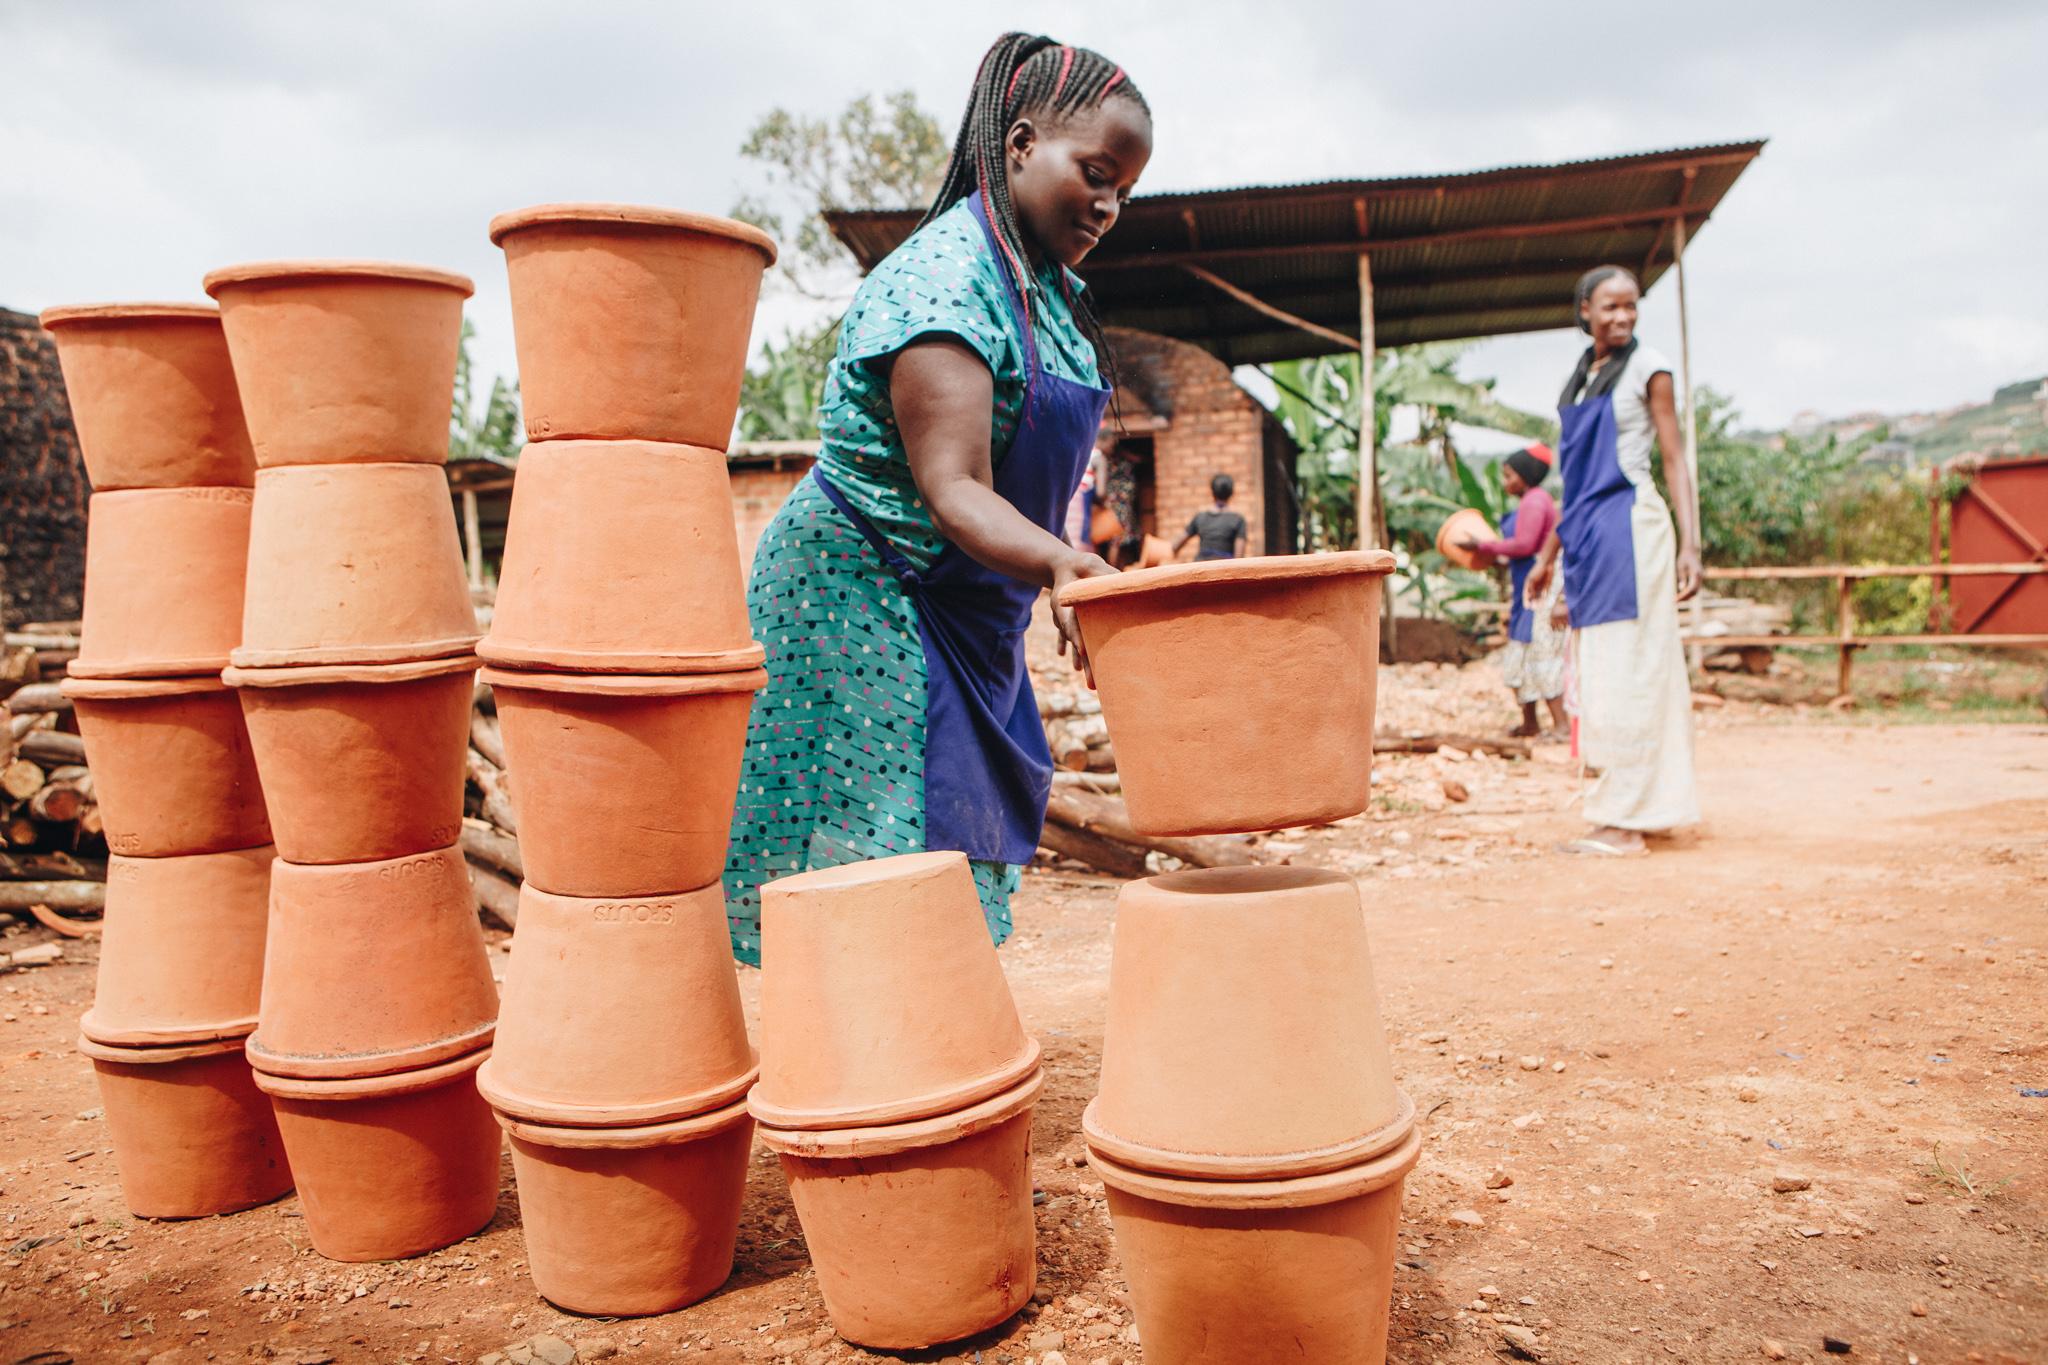 Spouts of Water, Uganda. Photo credit: Tom Woollard